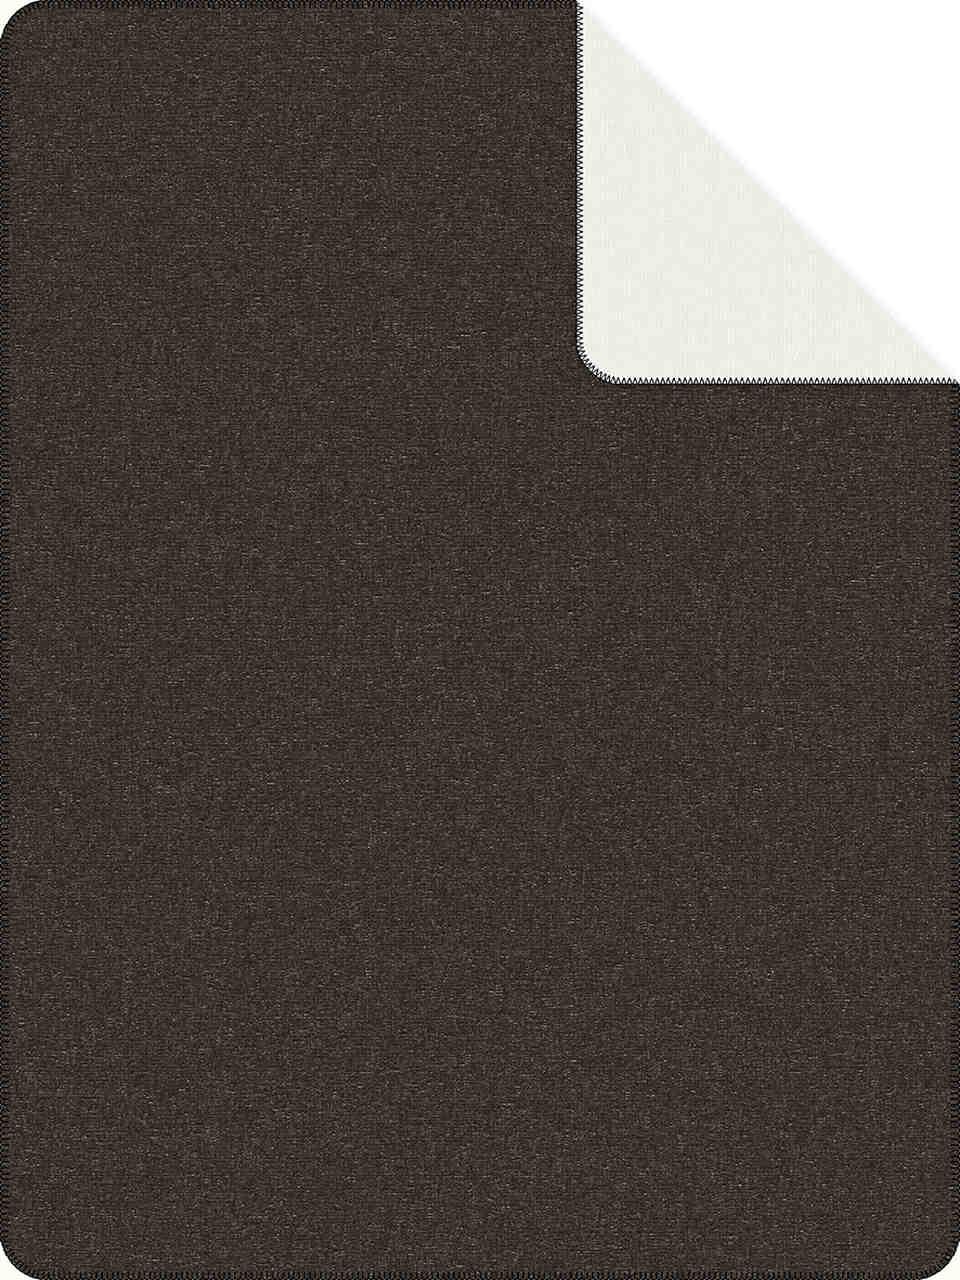 Classic-Line-Kolter-schwarz-weiss-webP8GtaEz67K5cp